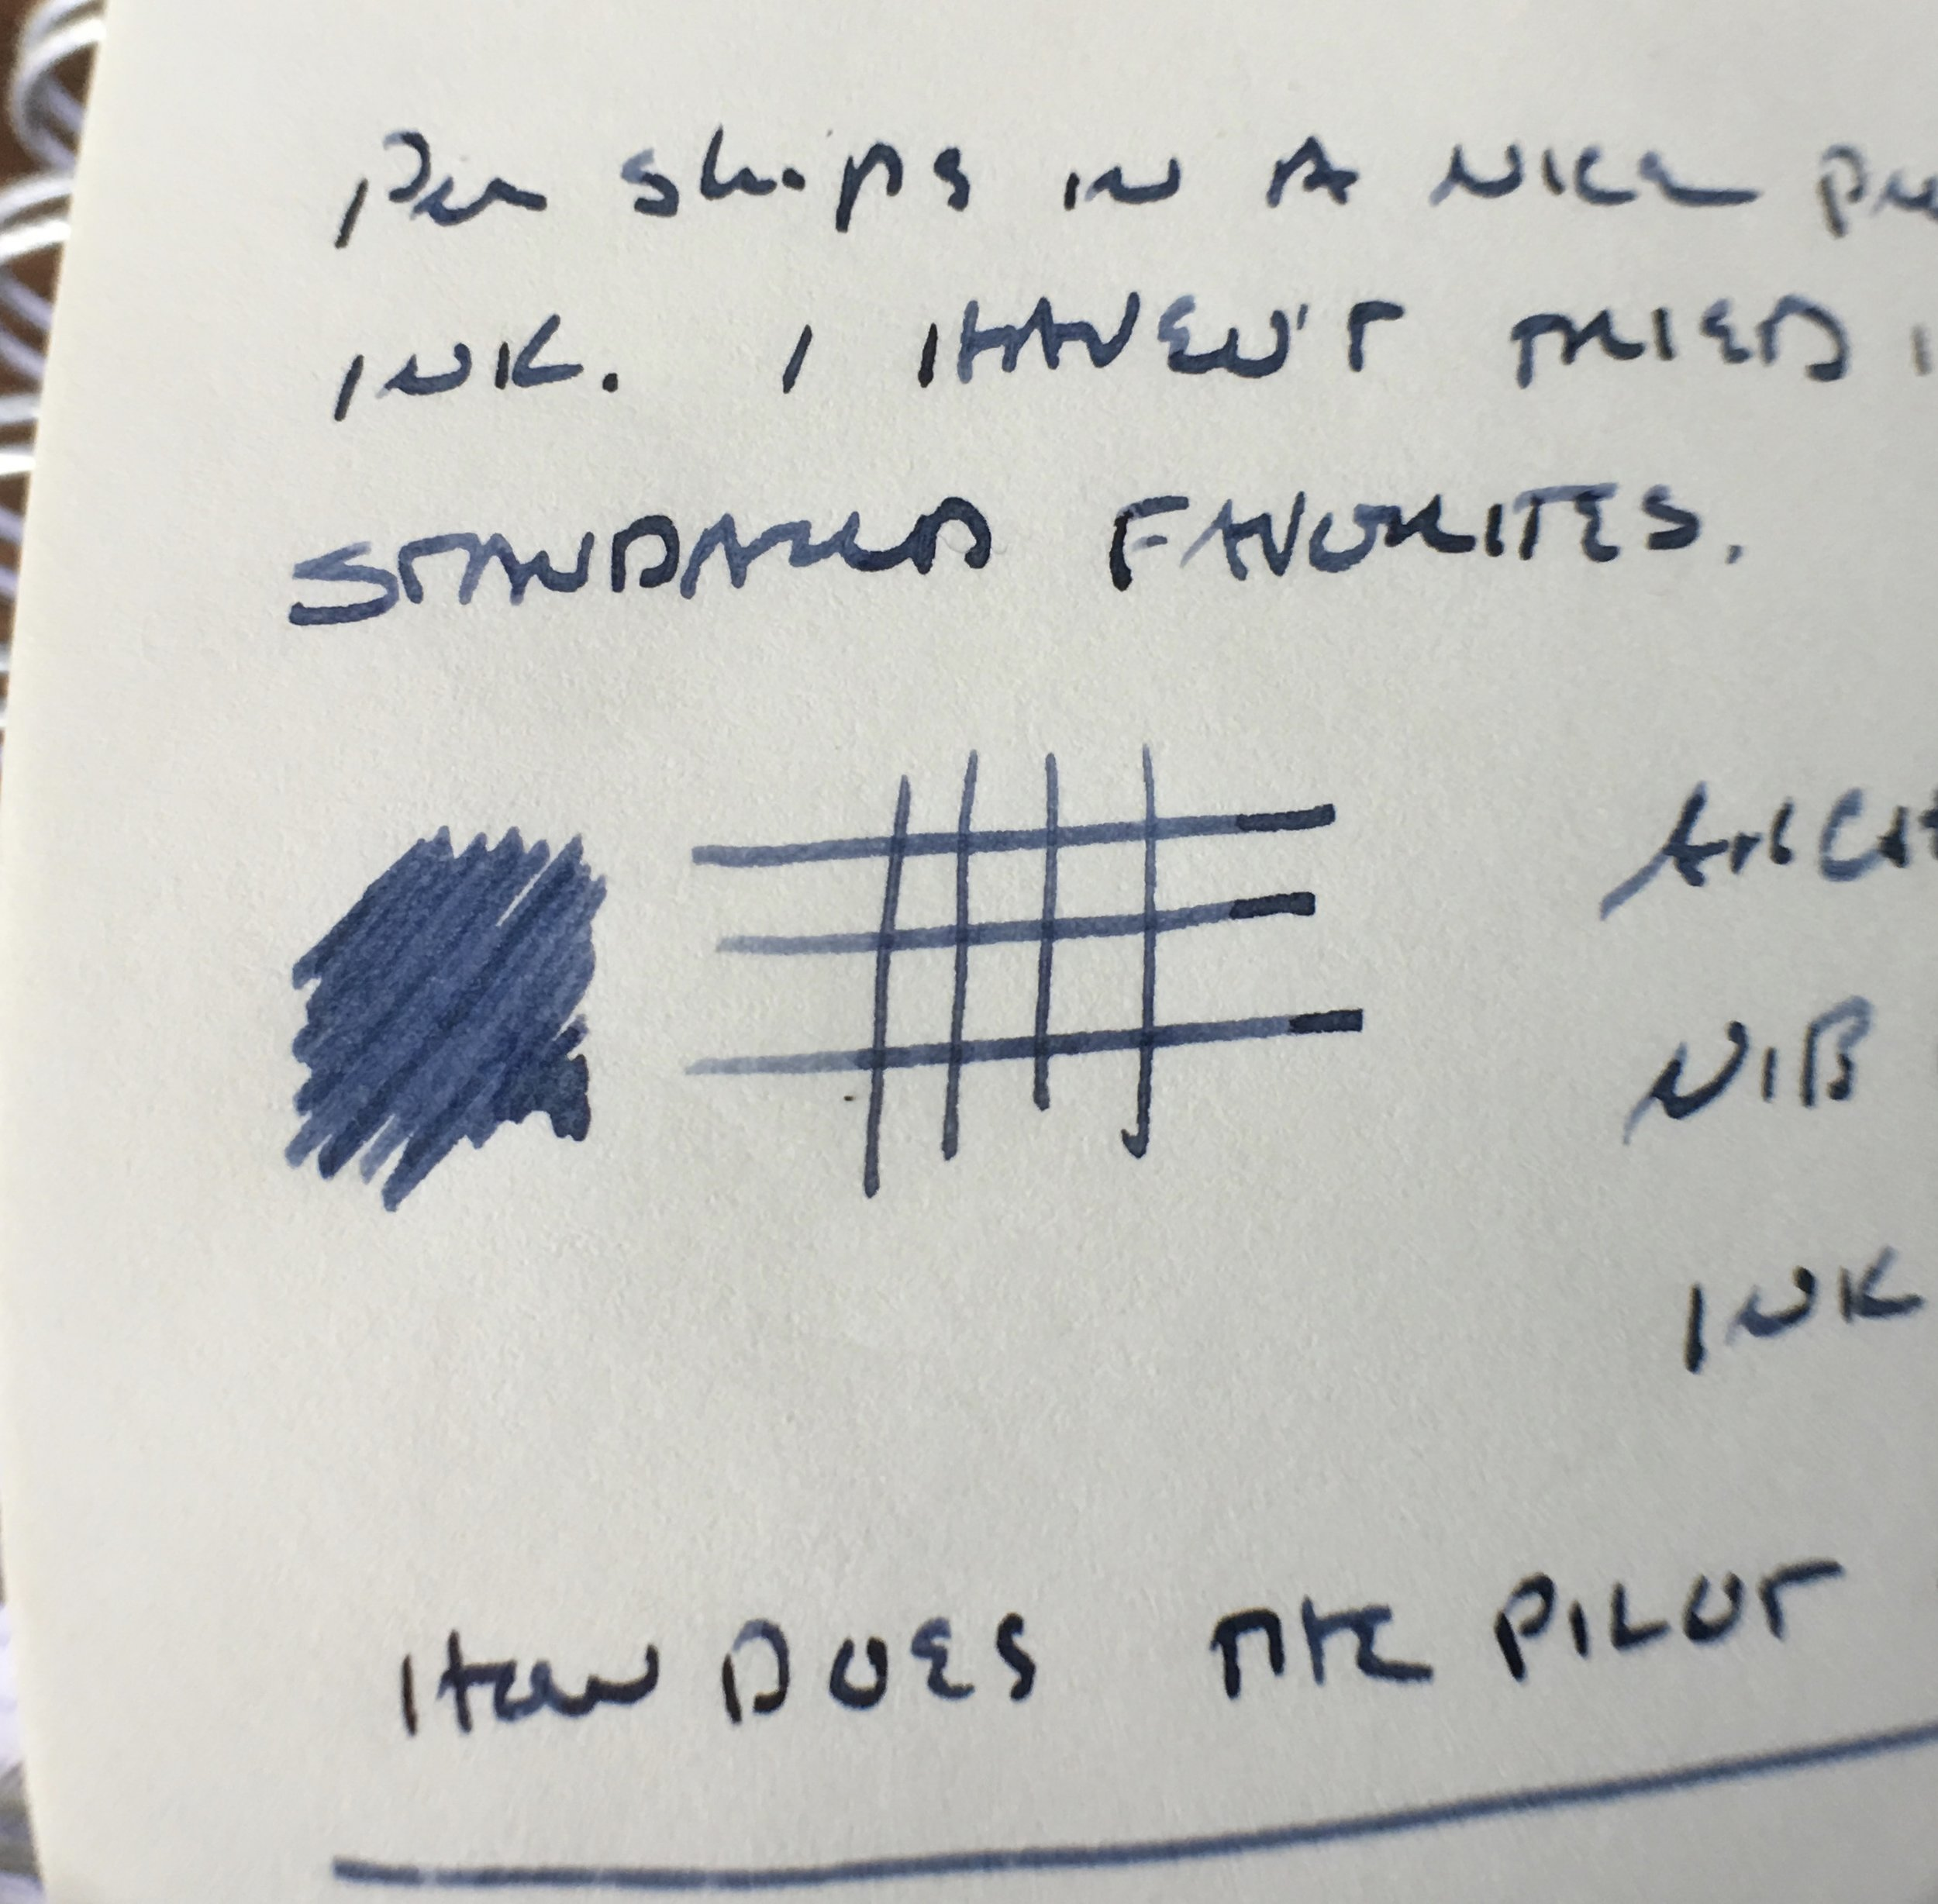 Writing sample of a medium architect's grind